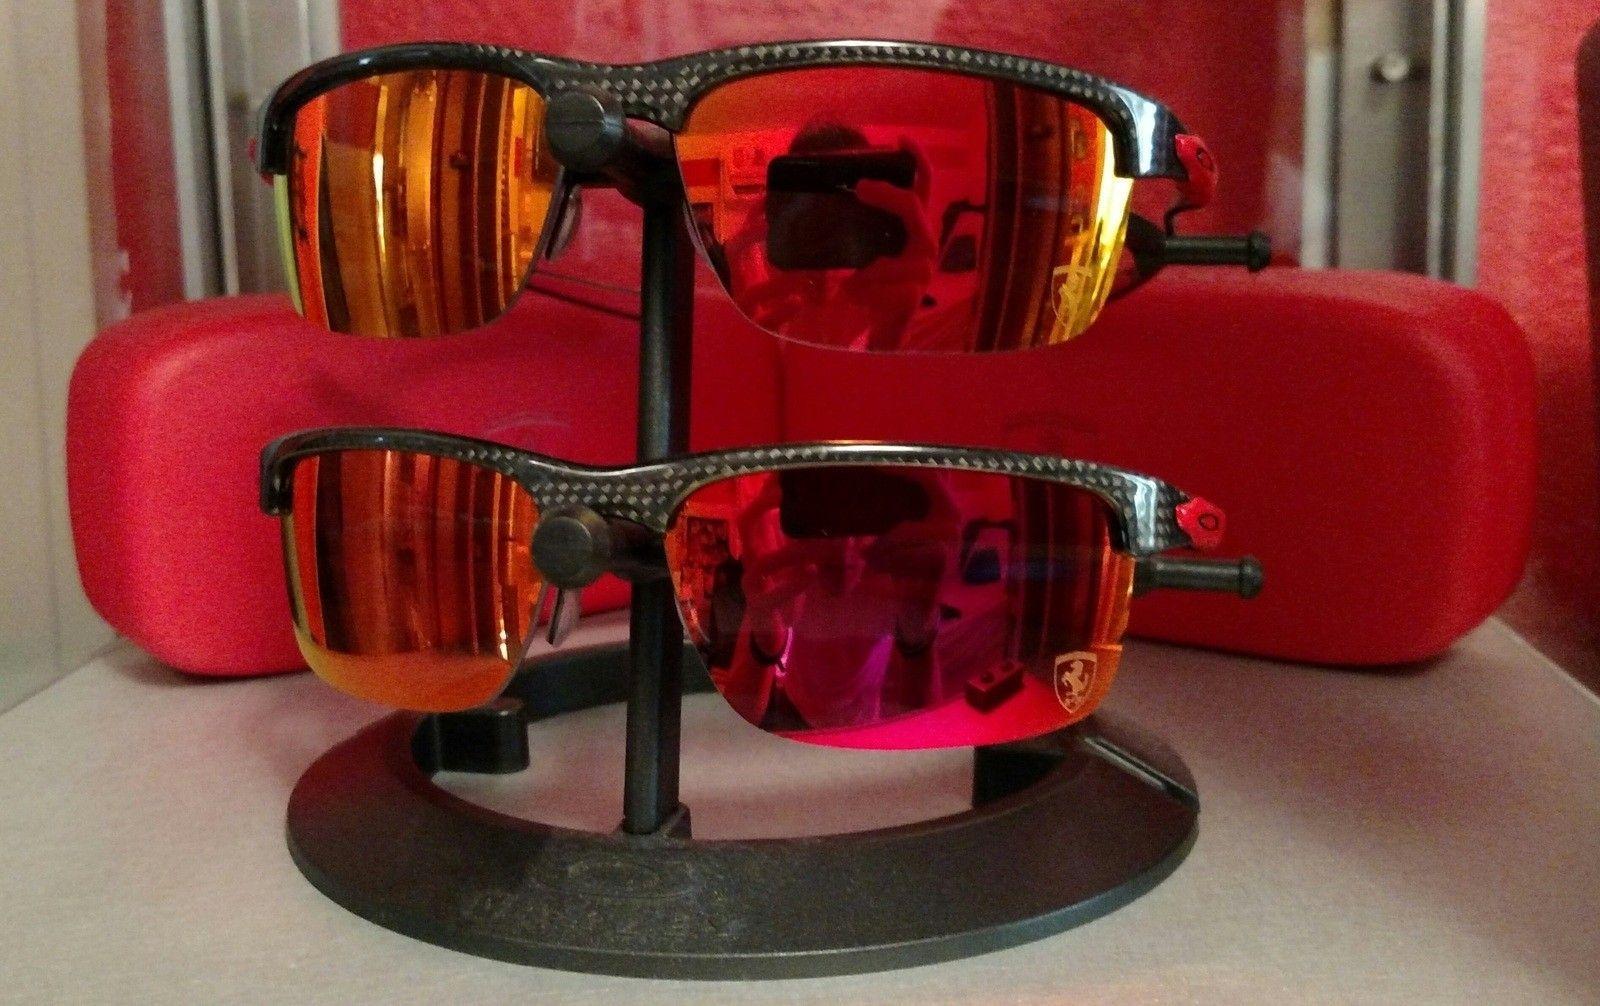 Carbon Blade lenses - _20150925_090834.JPG